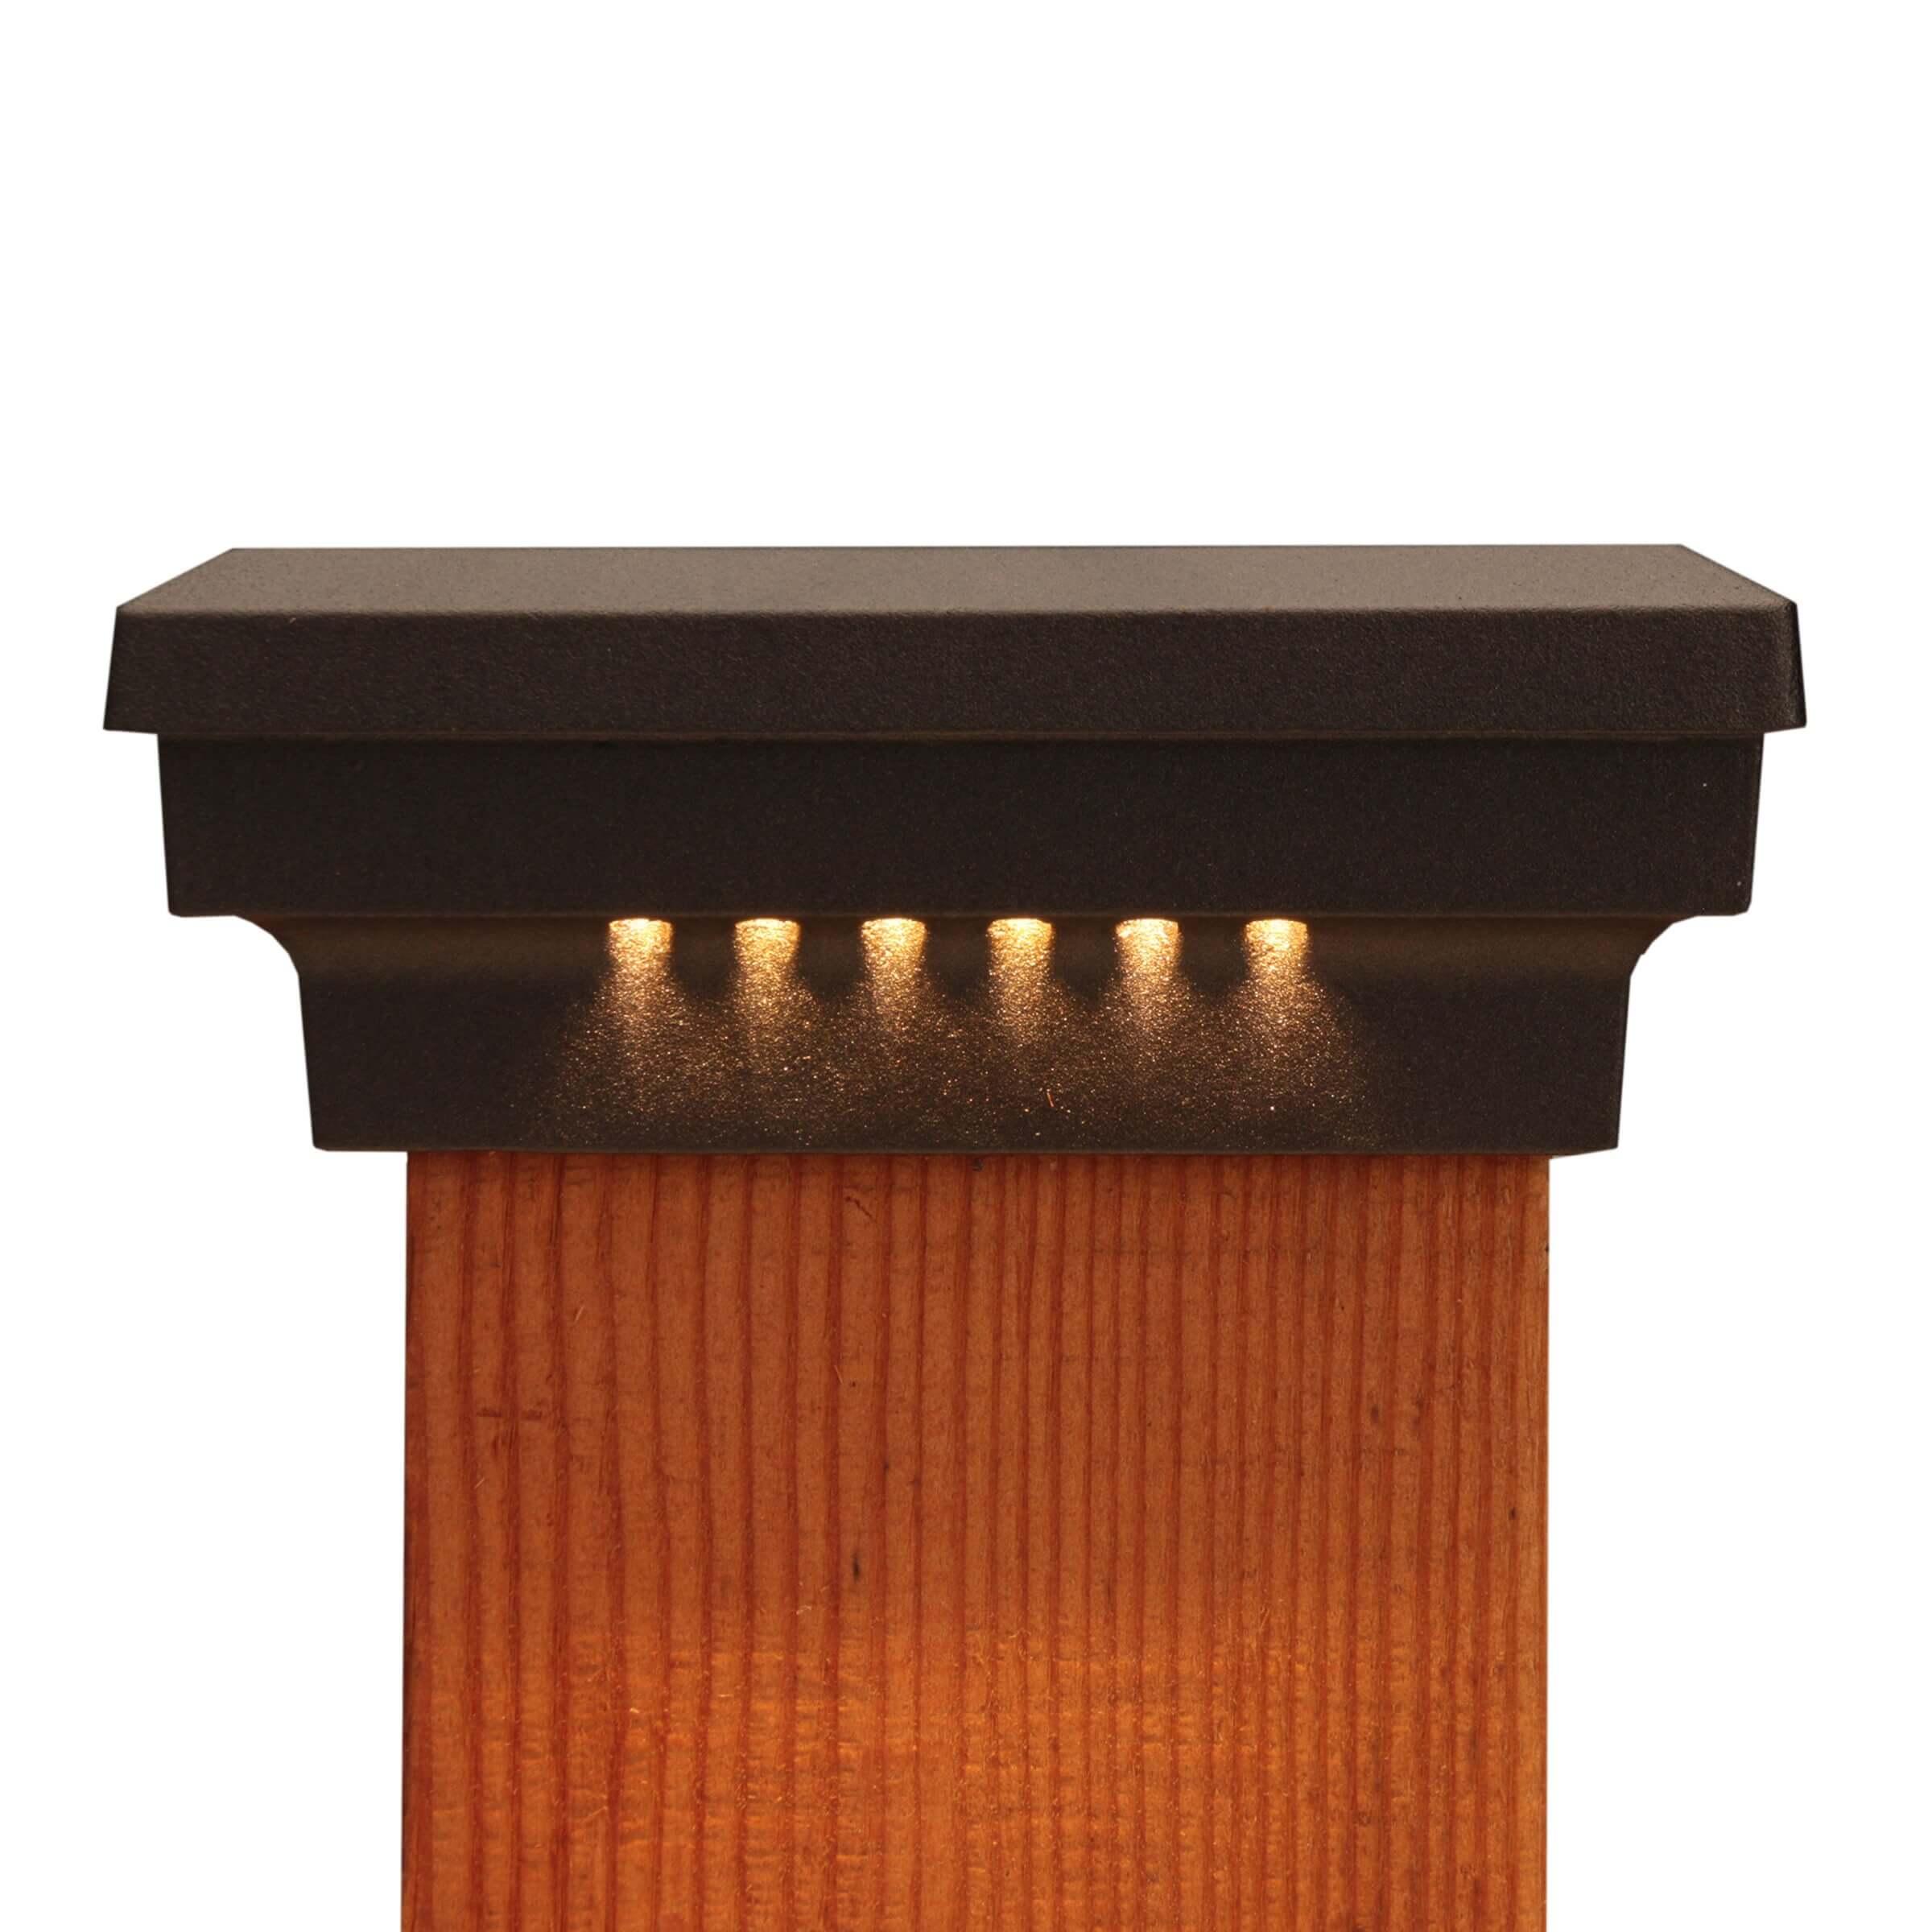 Best Of Led Post Cap Lights